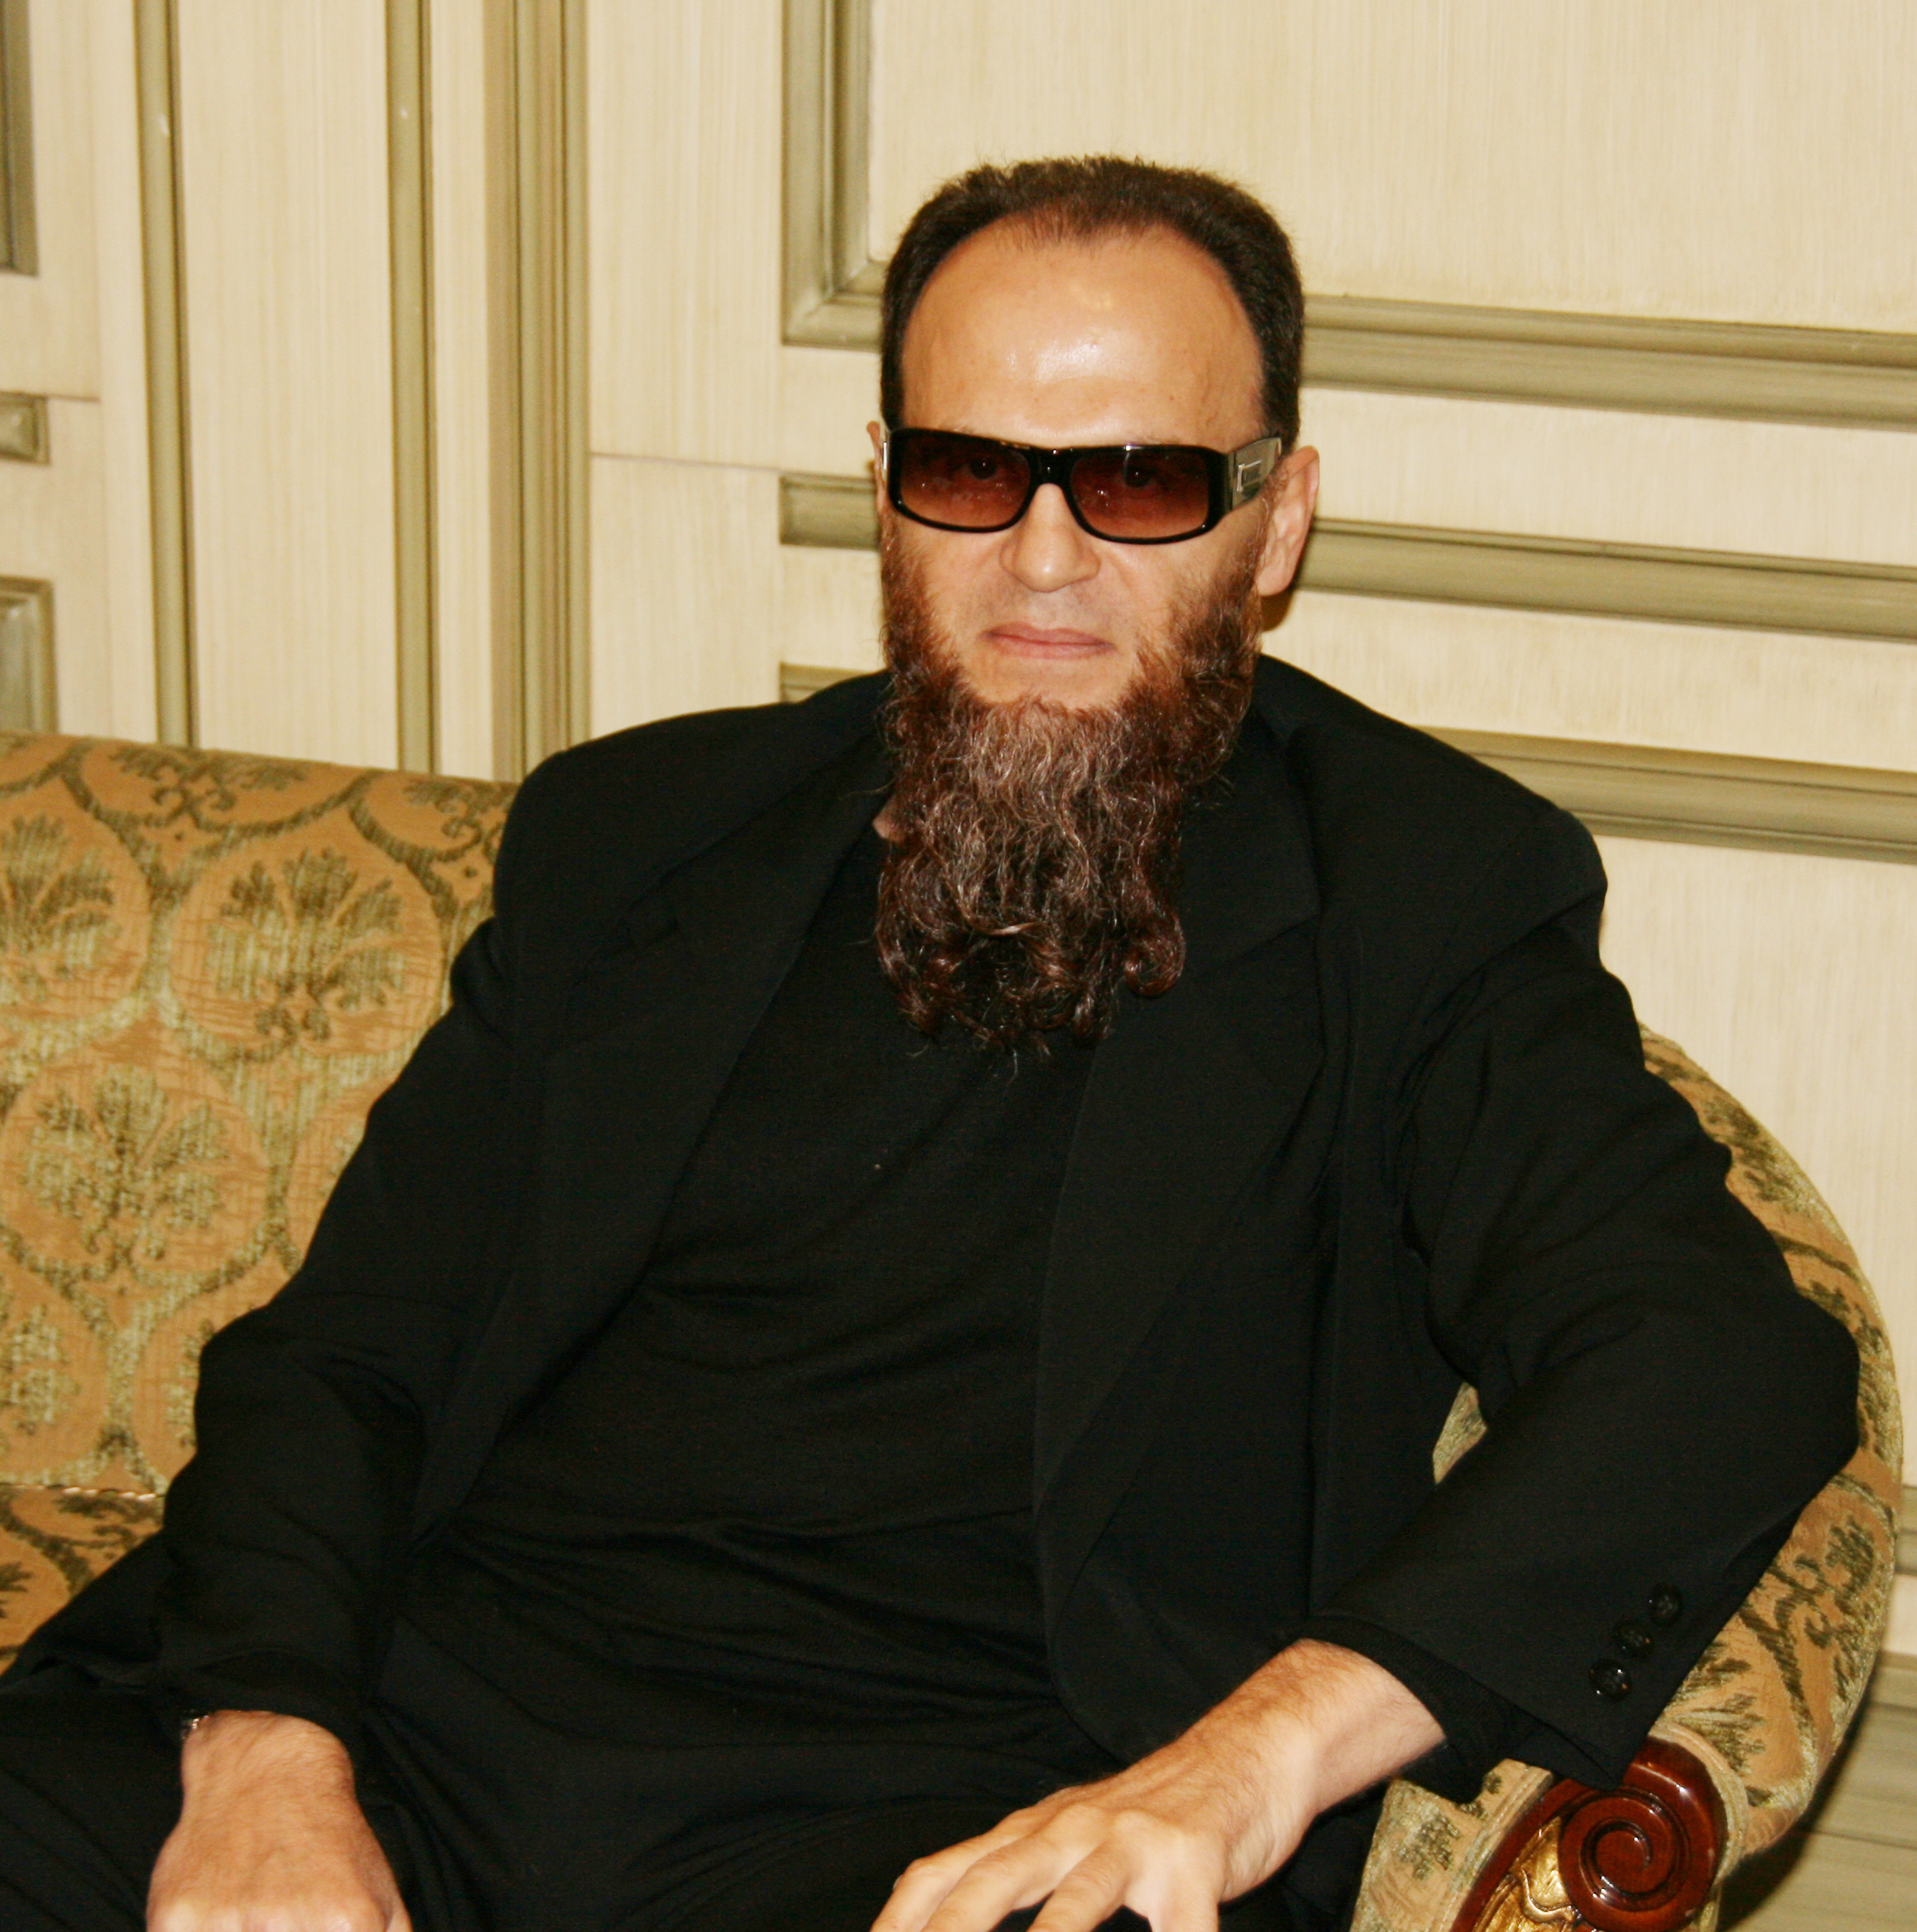 али-хан мамакаев фото